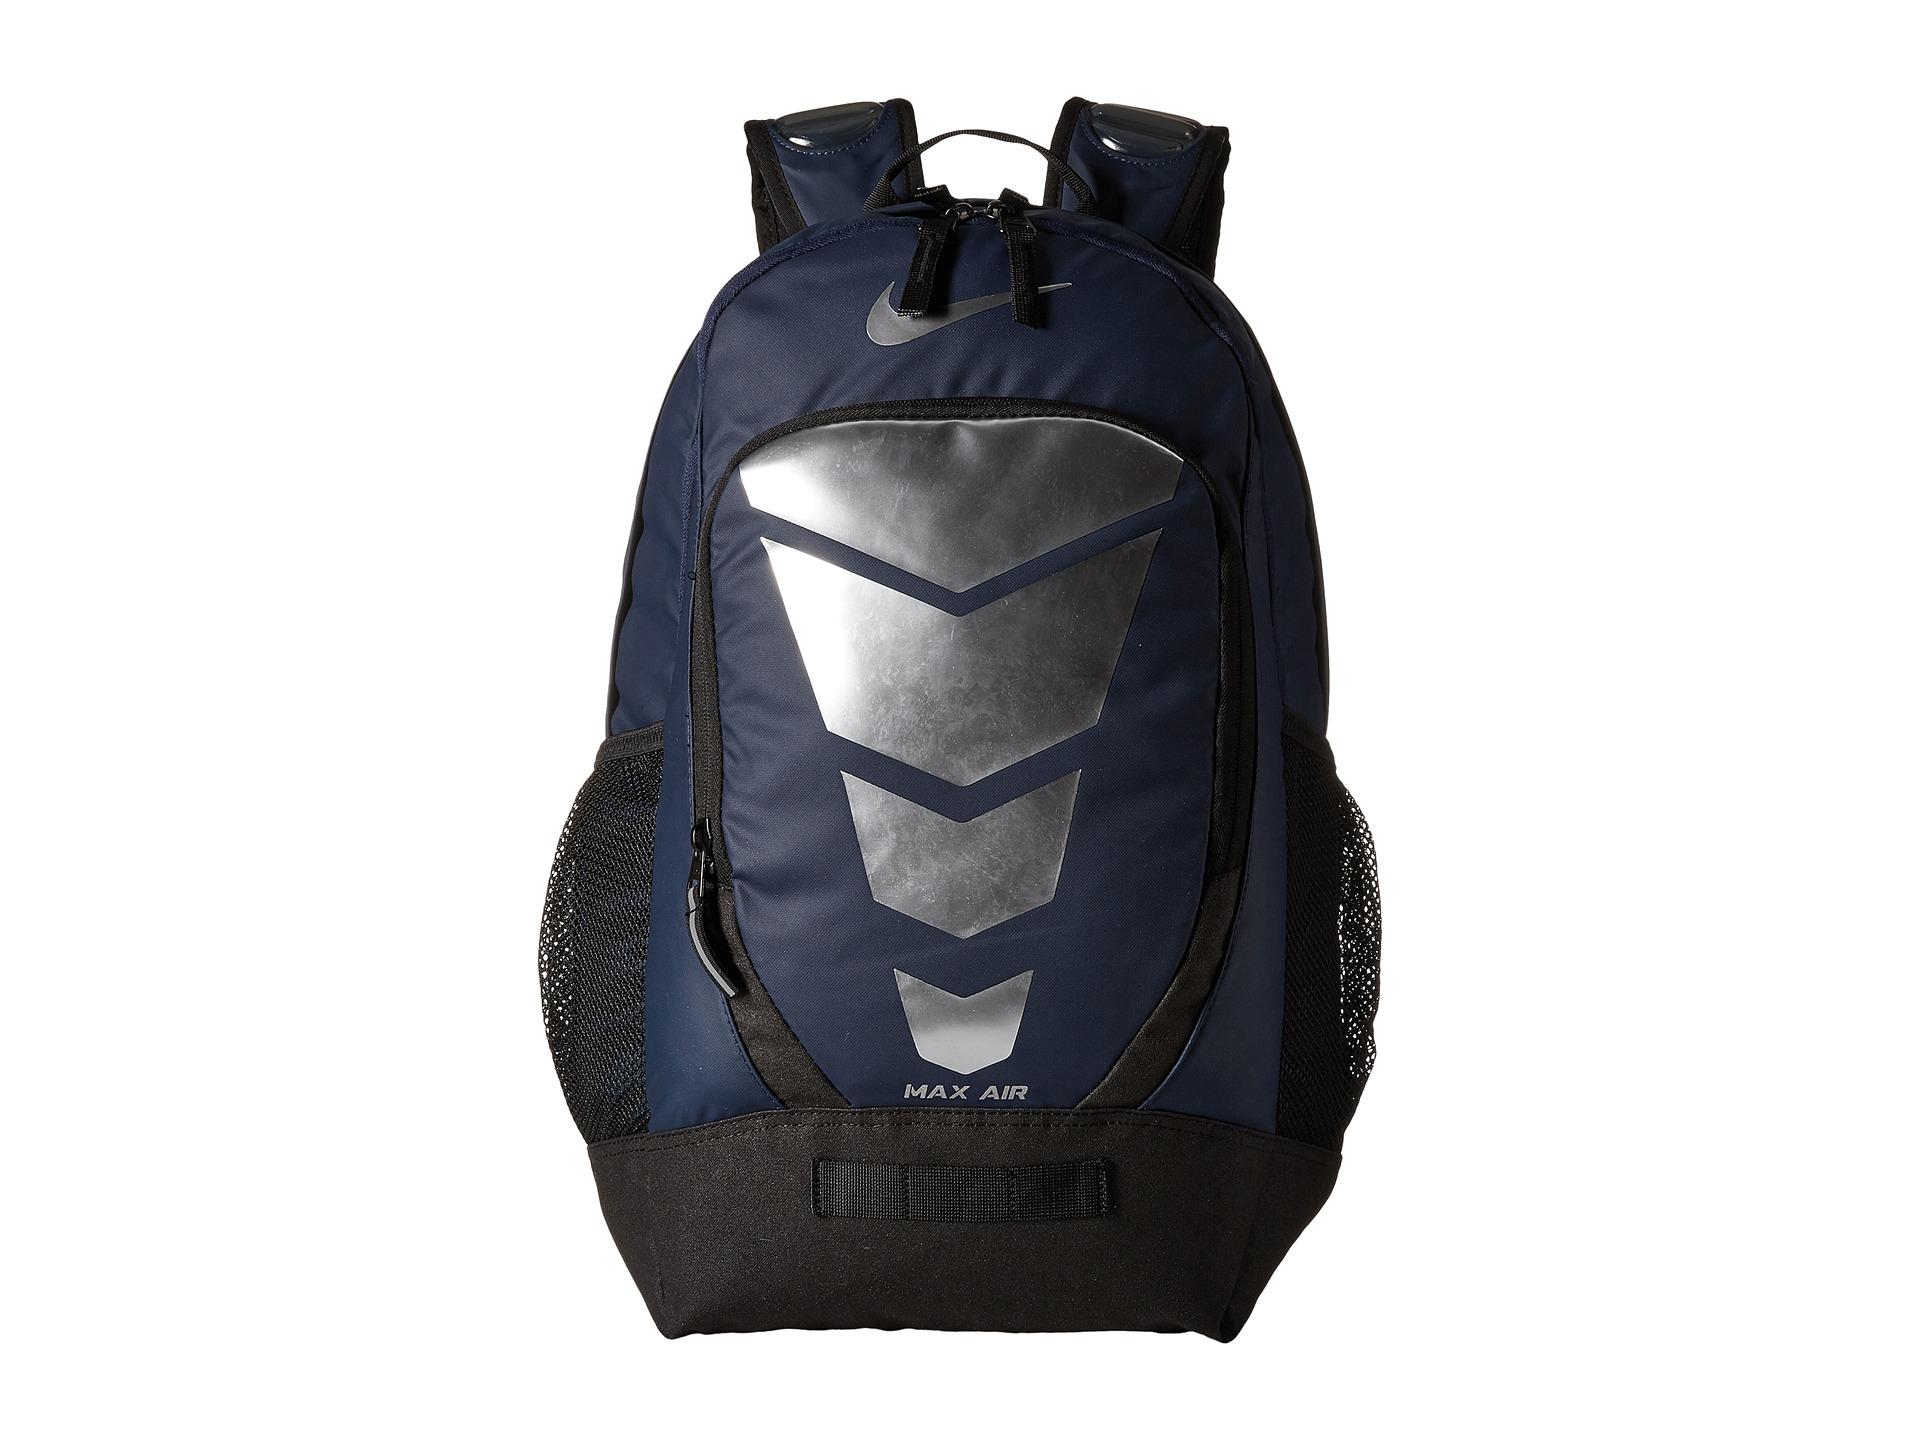 969361980eab Lyst - Nike Max Air Vapor Backpack Energy in Blue